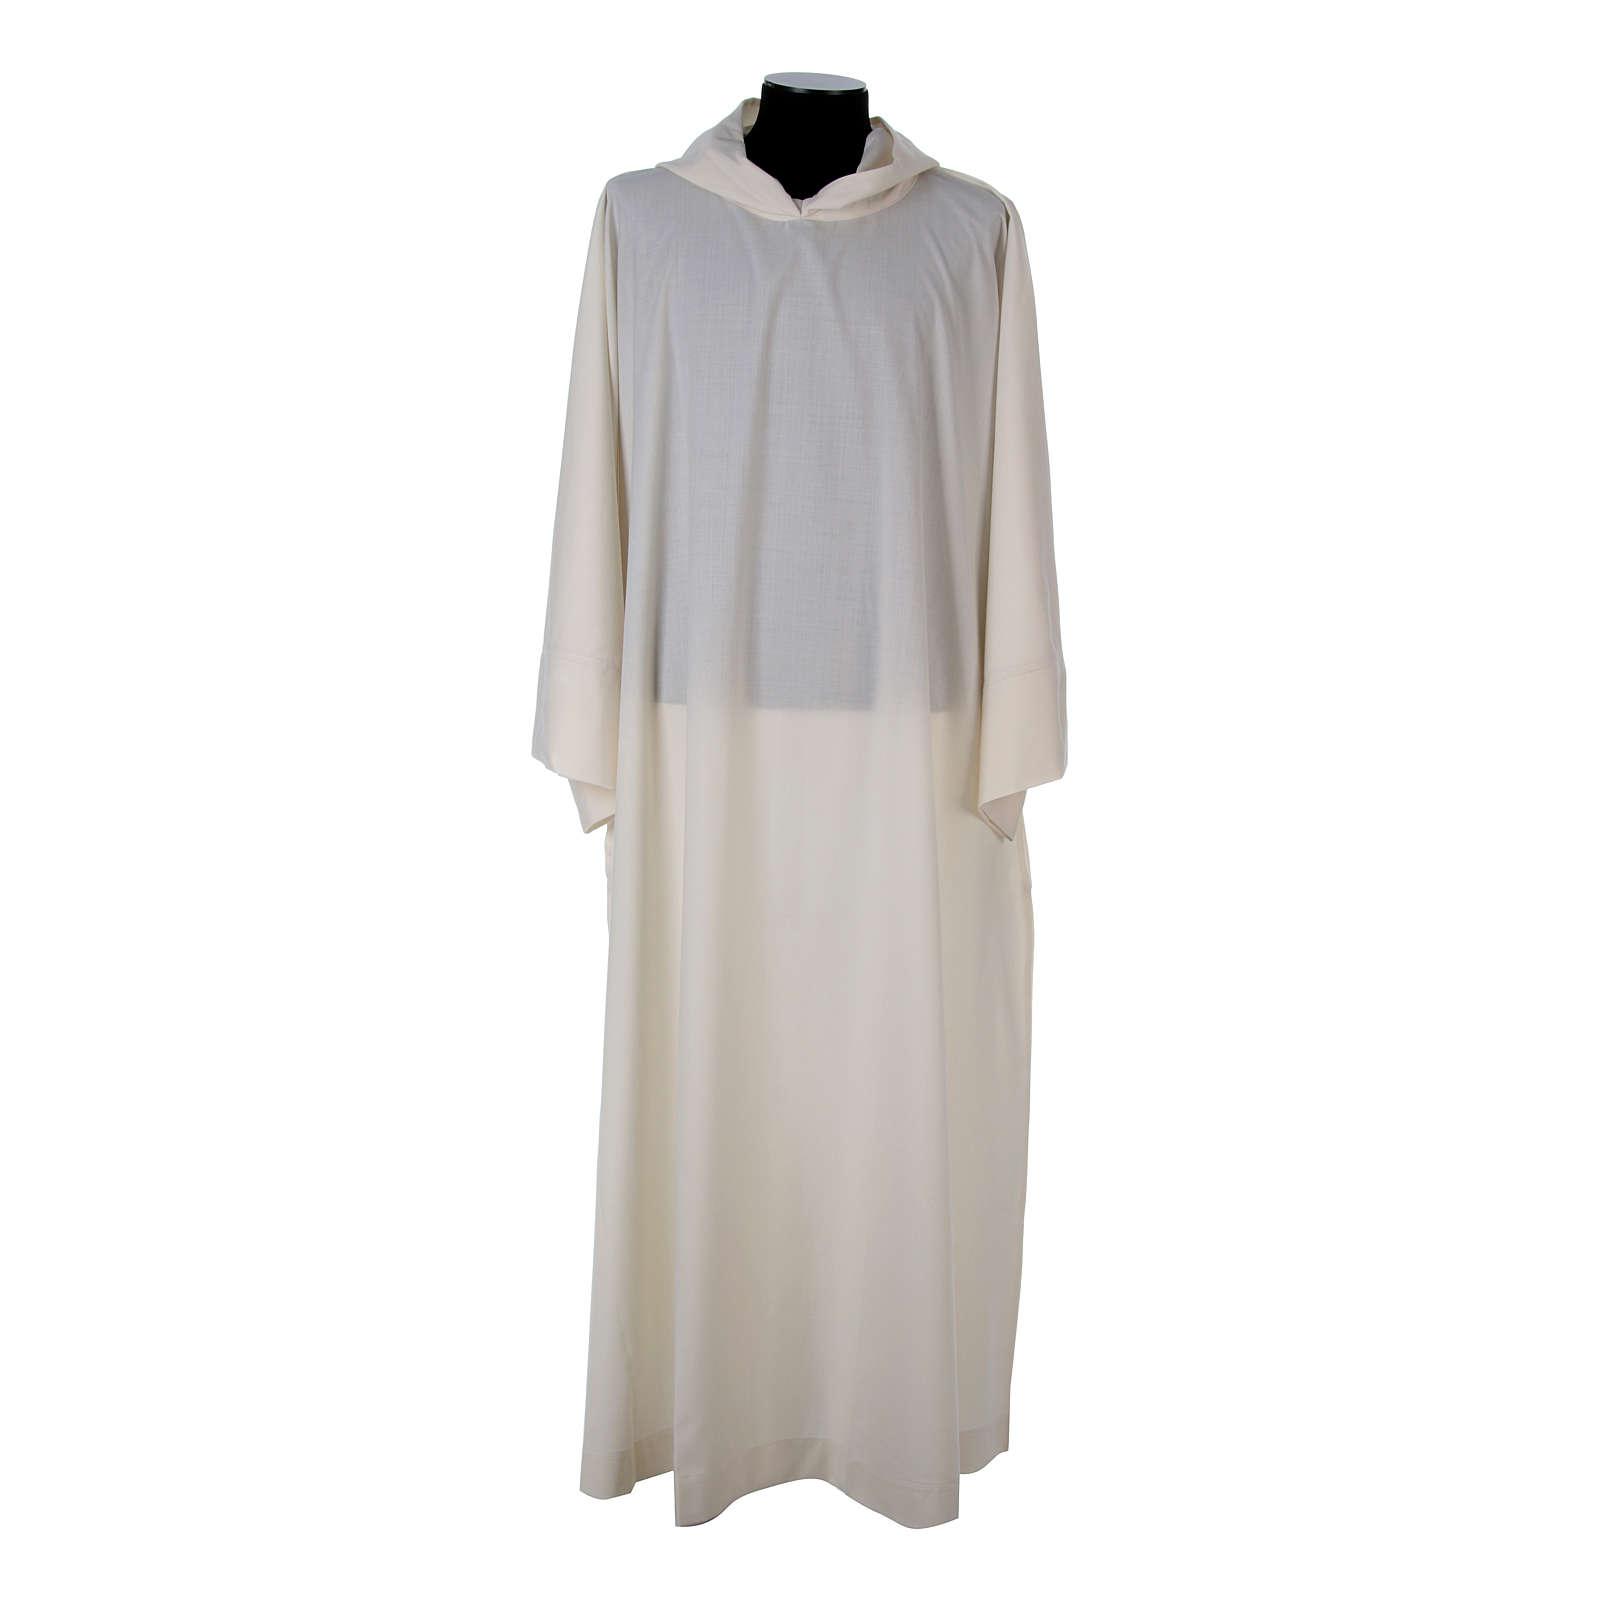 Alba lana poliéster capucha blanca 4